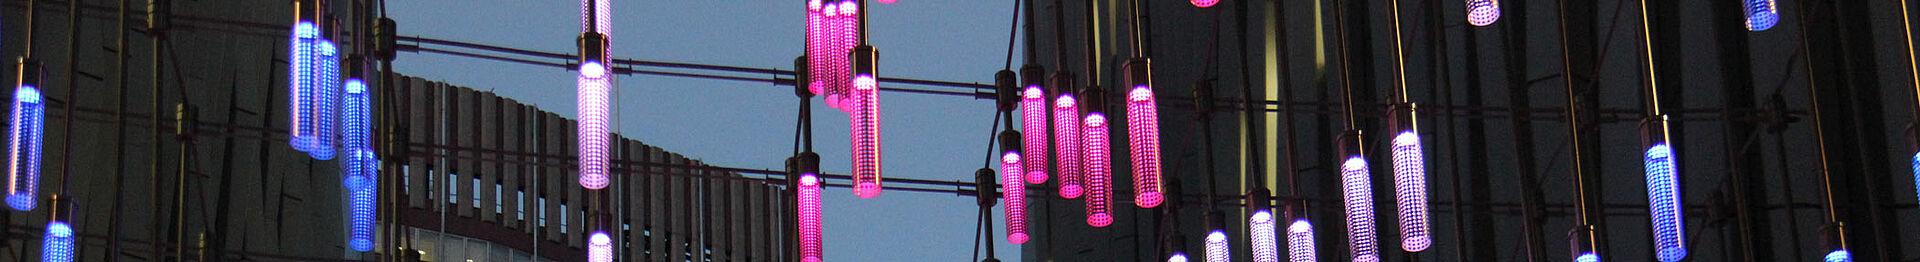 LED Light design I-SYS wire rope system NOVA London Catenary lights